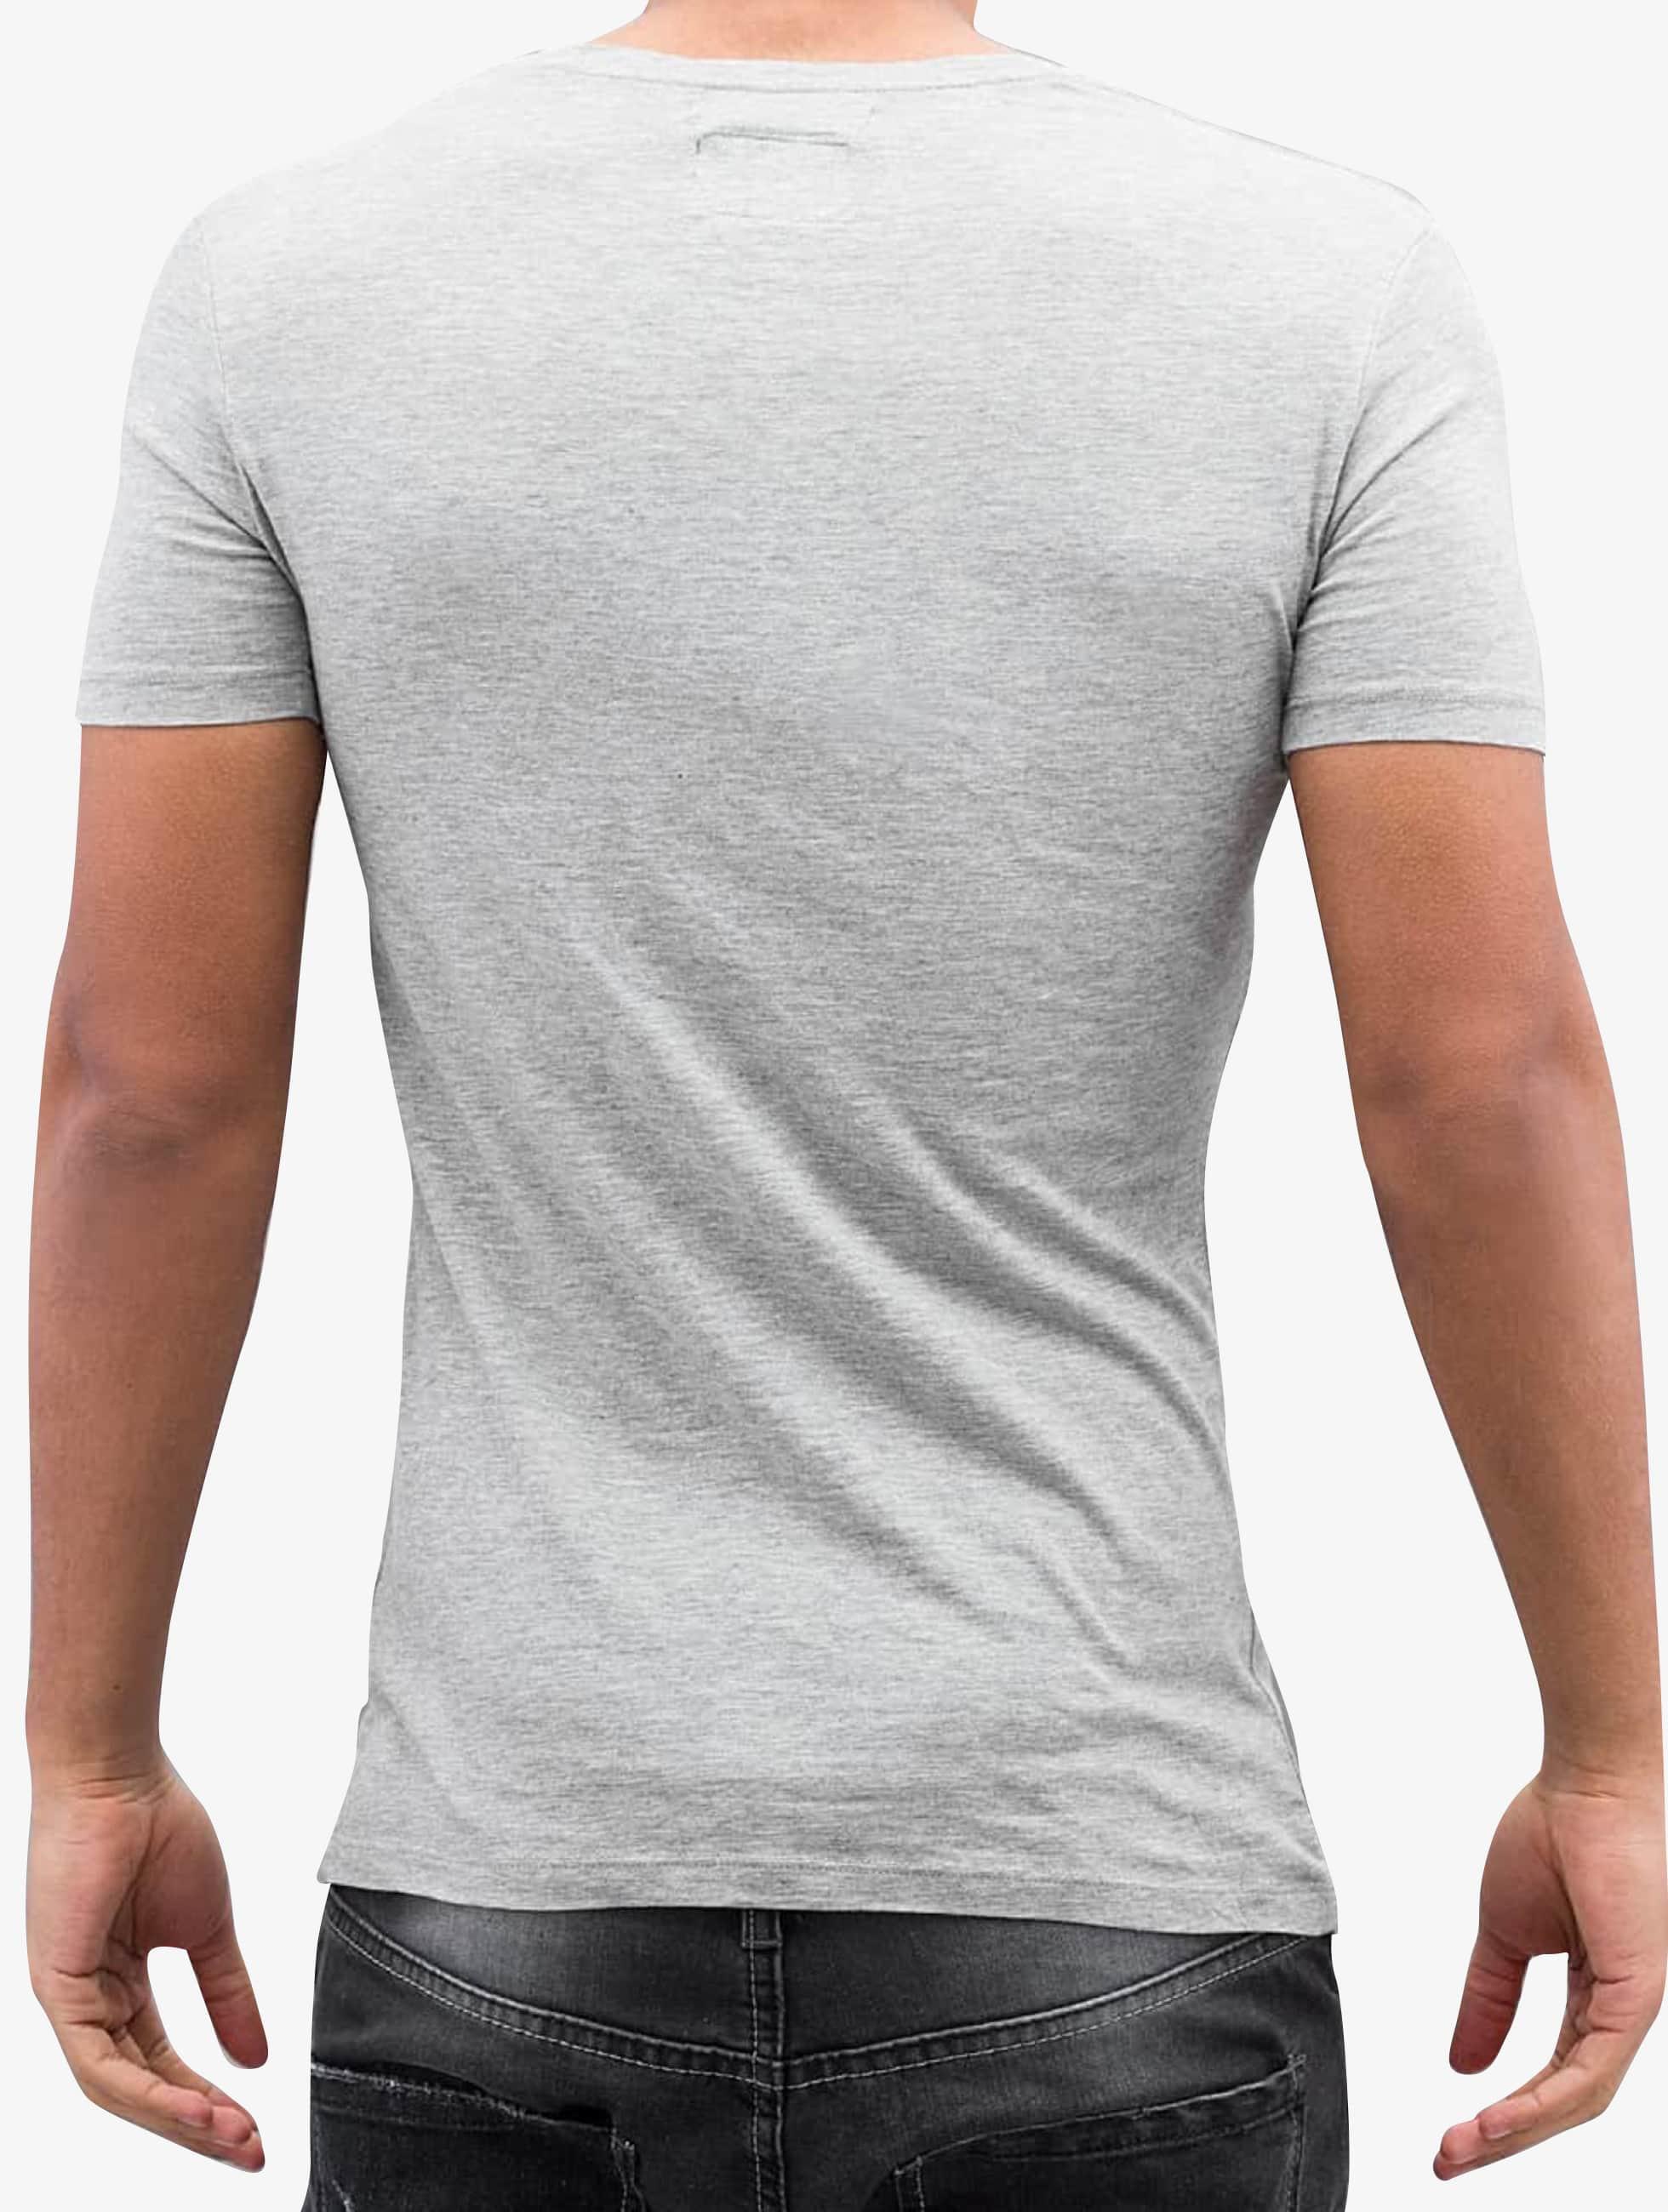 Amsterdenim T-shirt Aad grigio